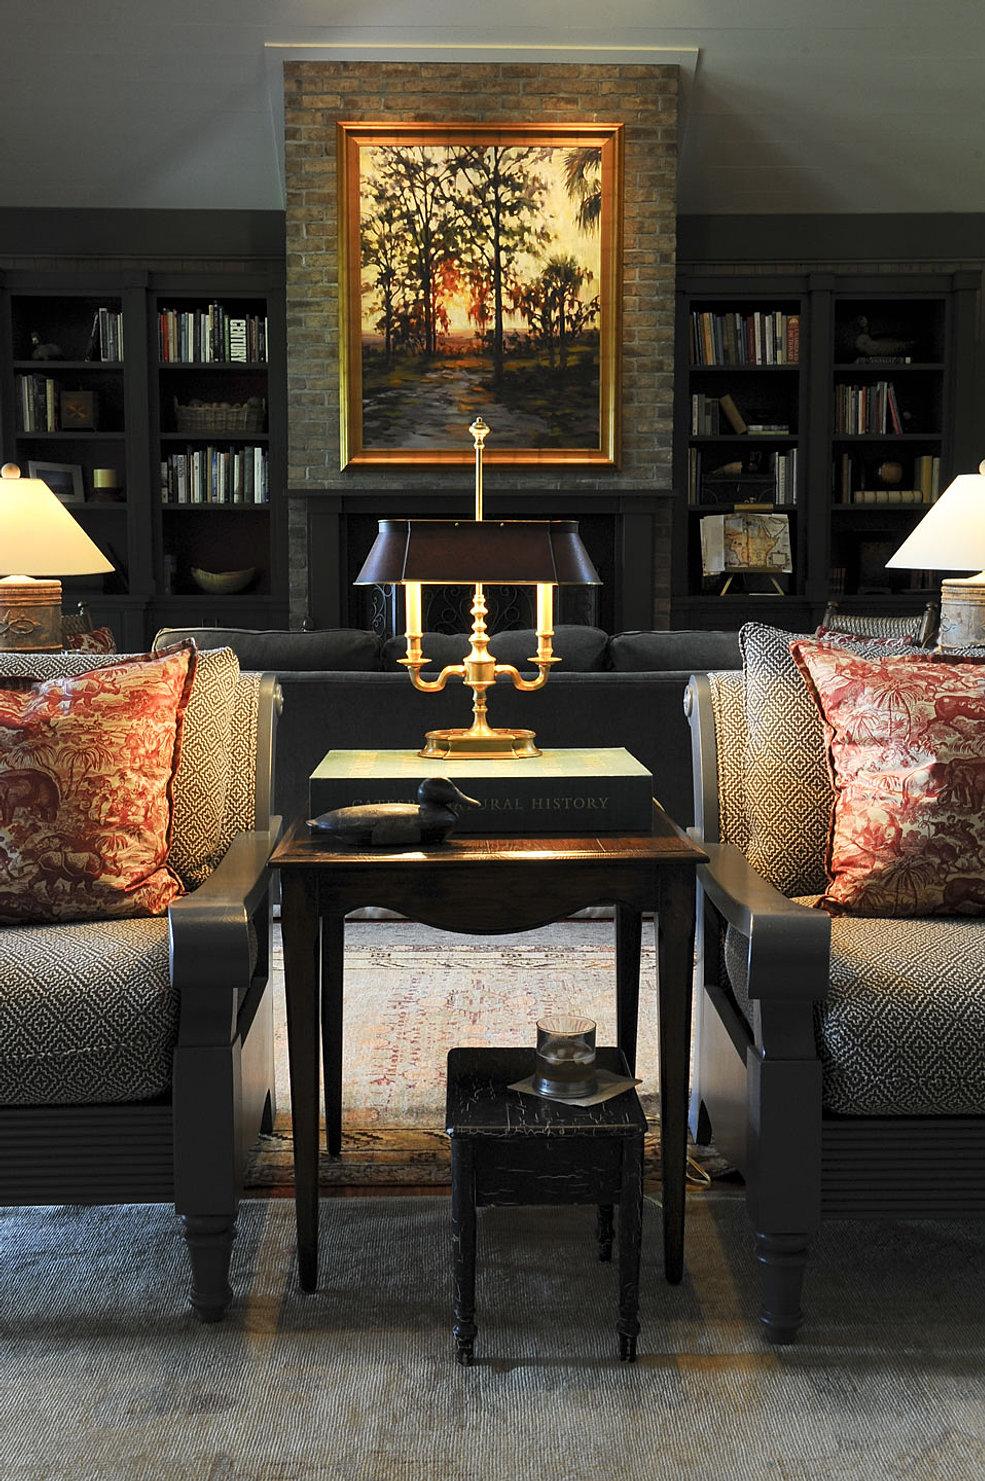 Linn gresham haute decor interior design savannah for Haute decor